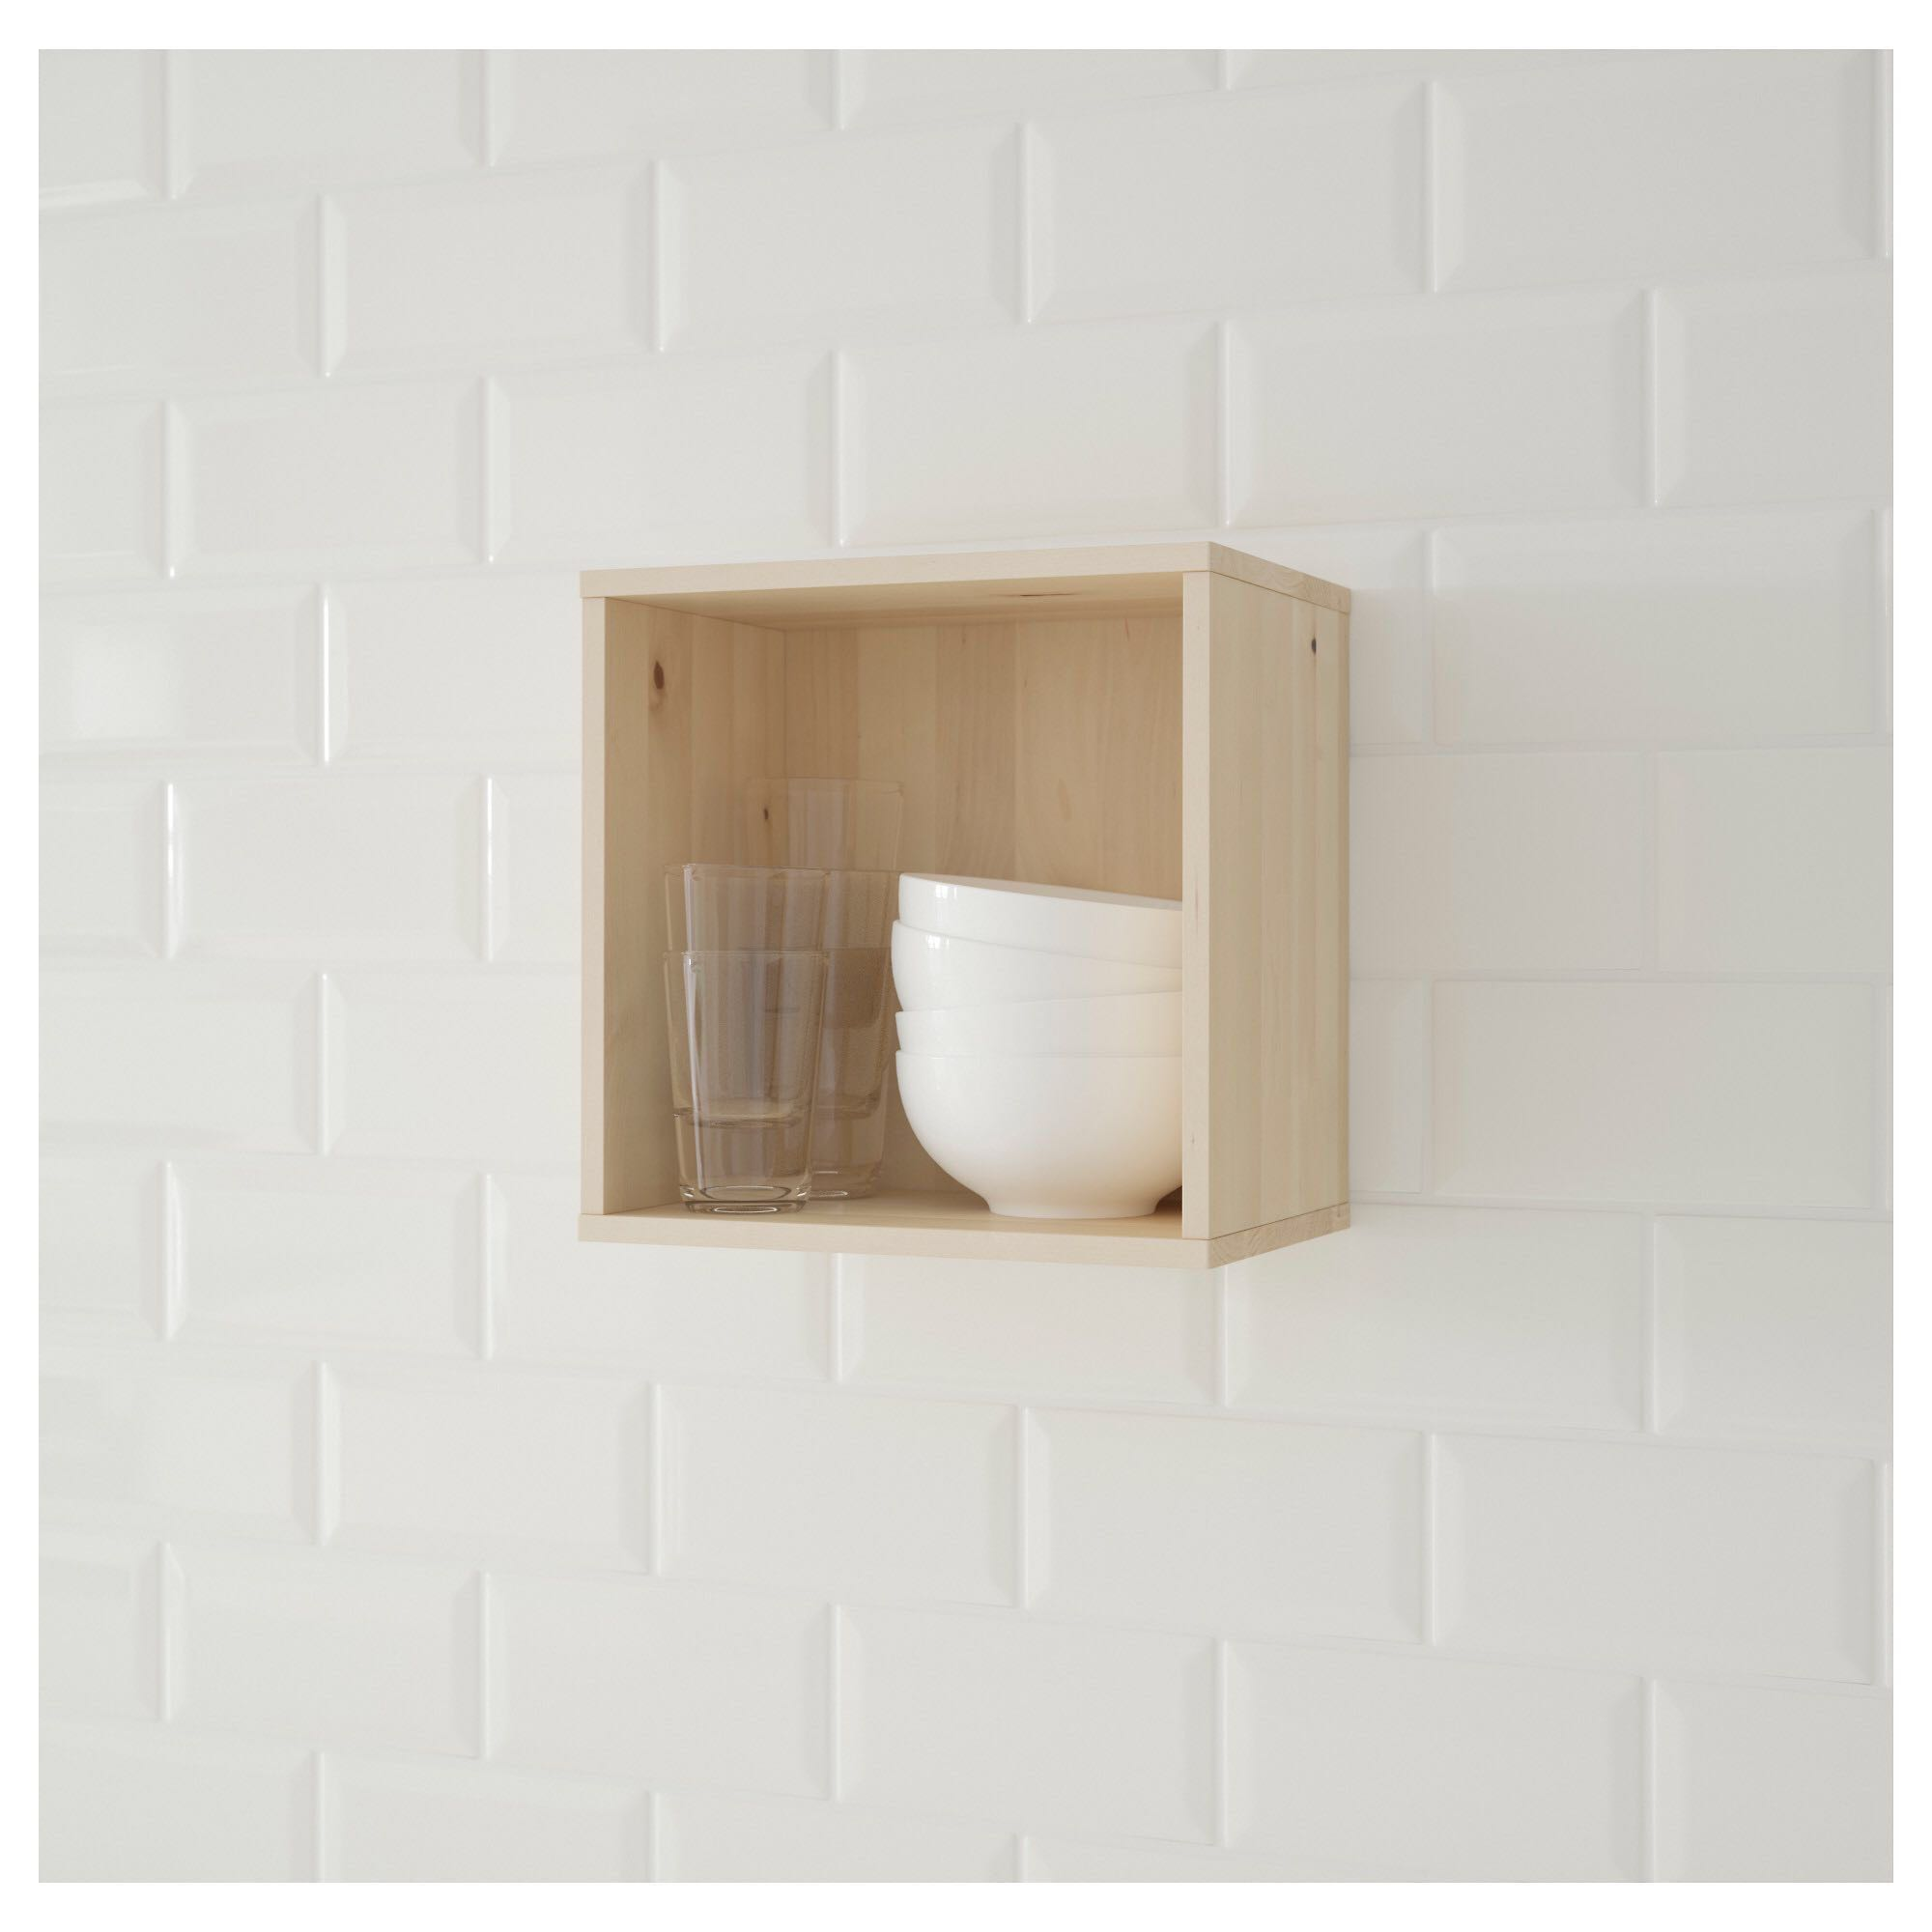 Forhoja Wall/Floor Cabinet - Wood (Discontinued)